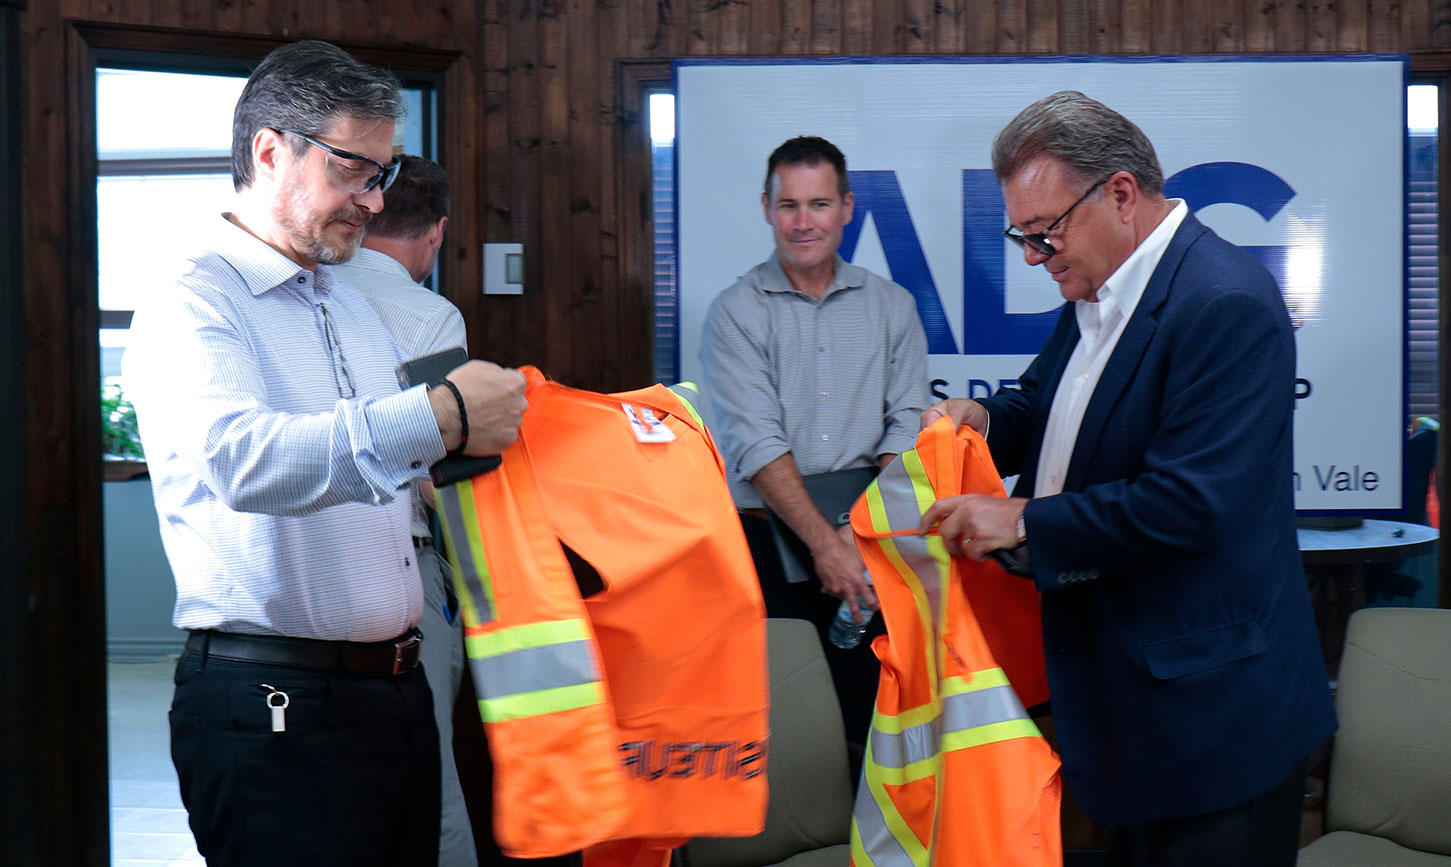 AirBoss leadership visit Acton Vale